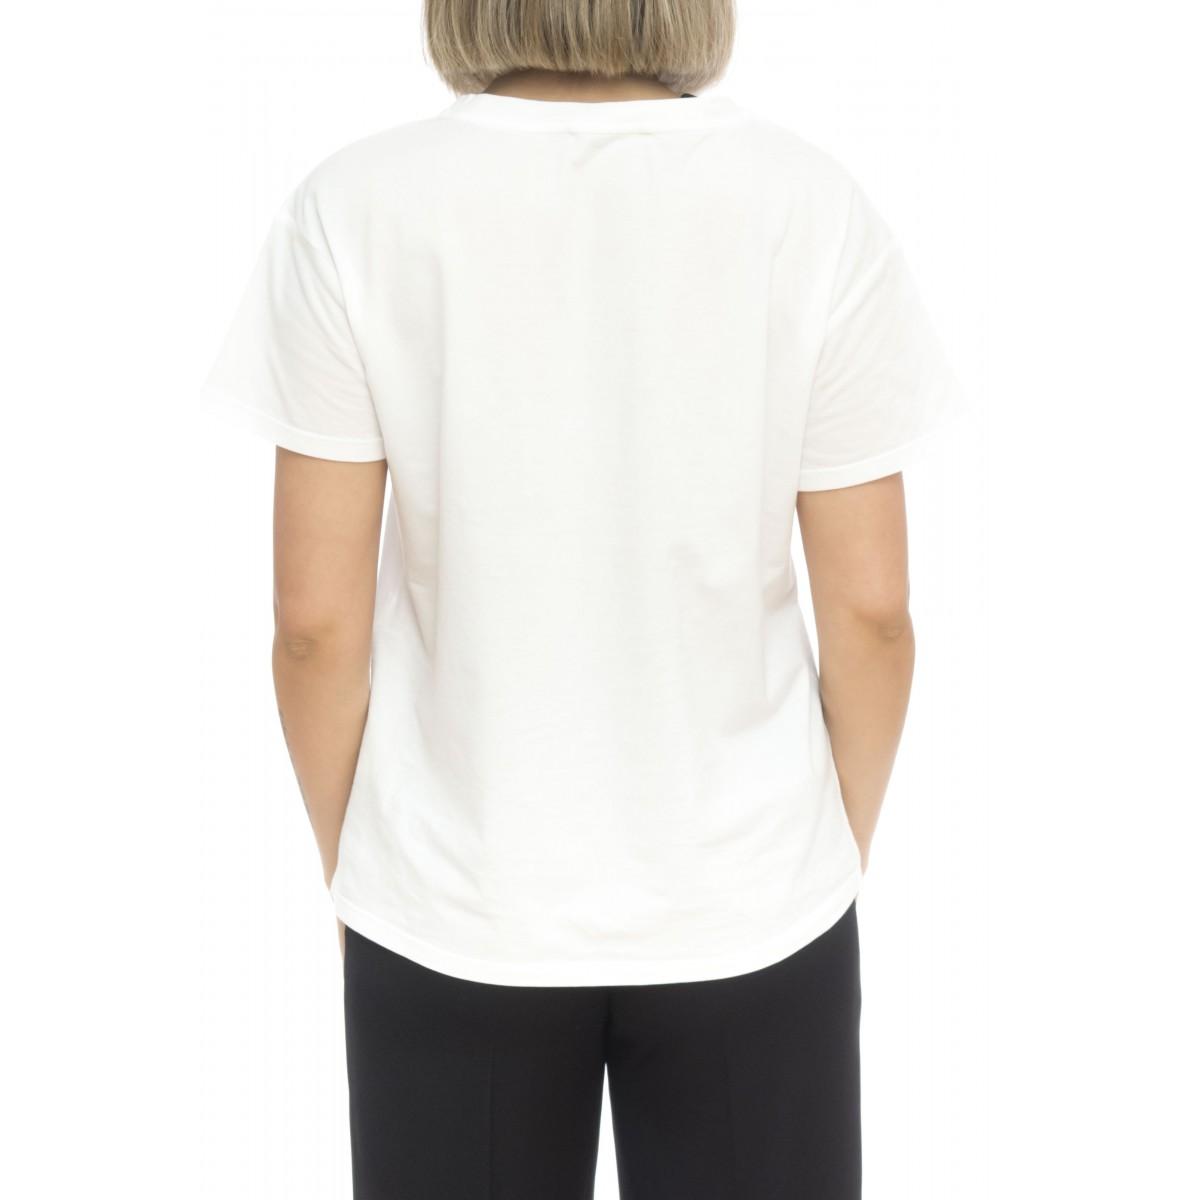 T-shirt - 2602 t-shirt applicazione